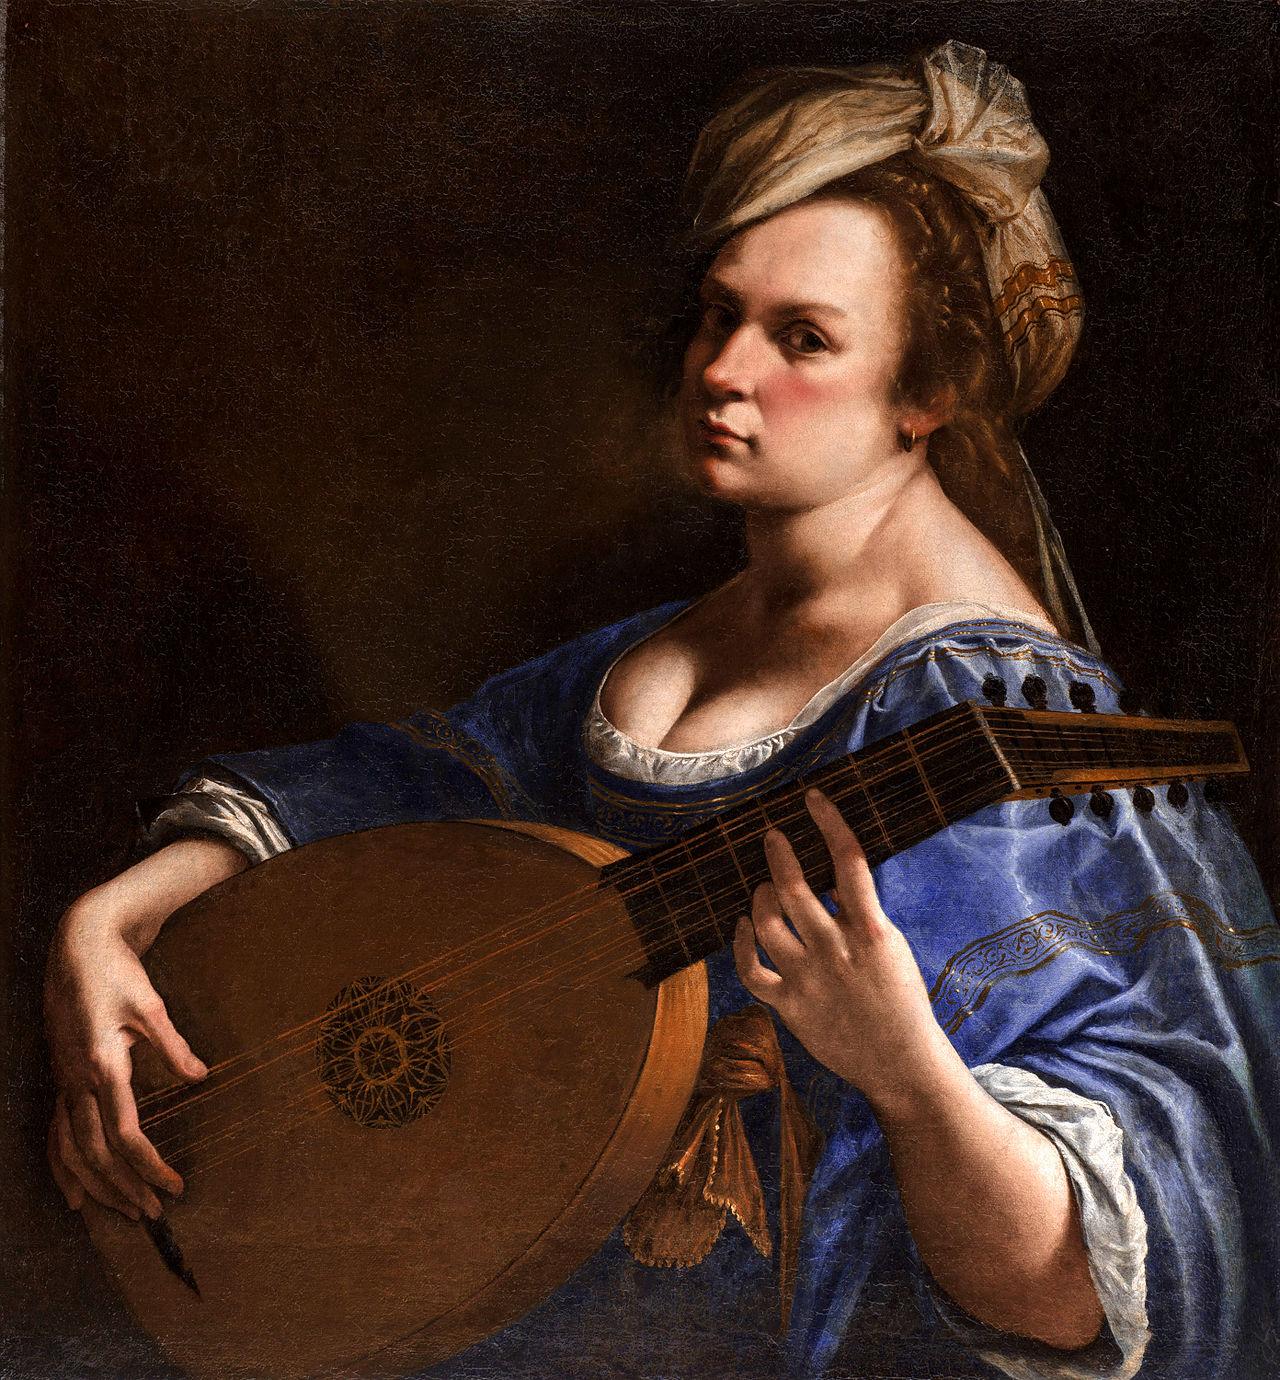 Rome show explores painter Artemisia Gentileschi\u0027s art, life